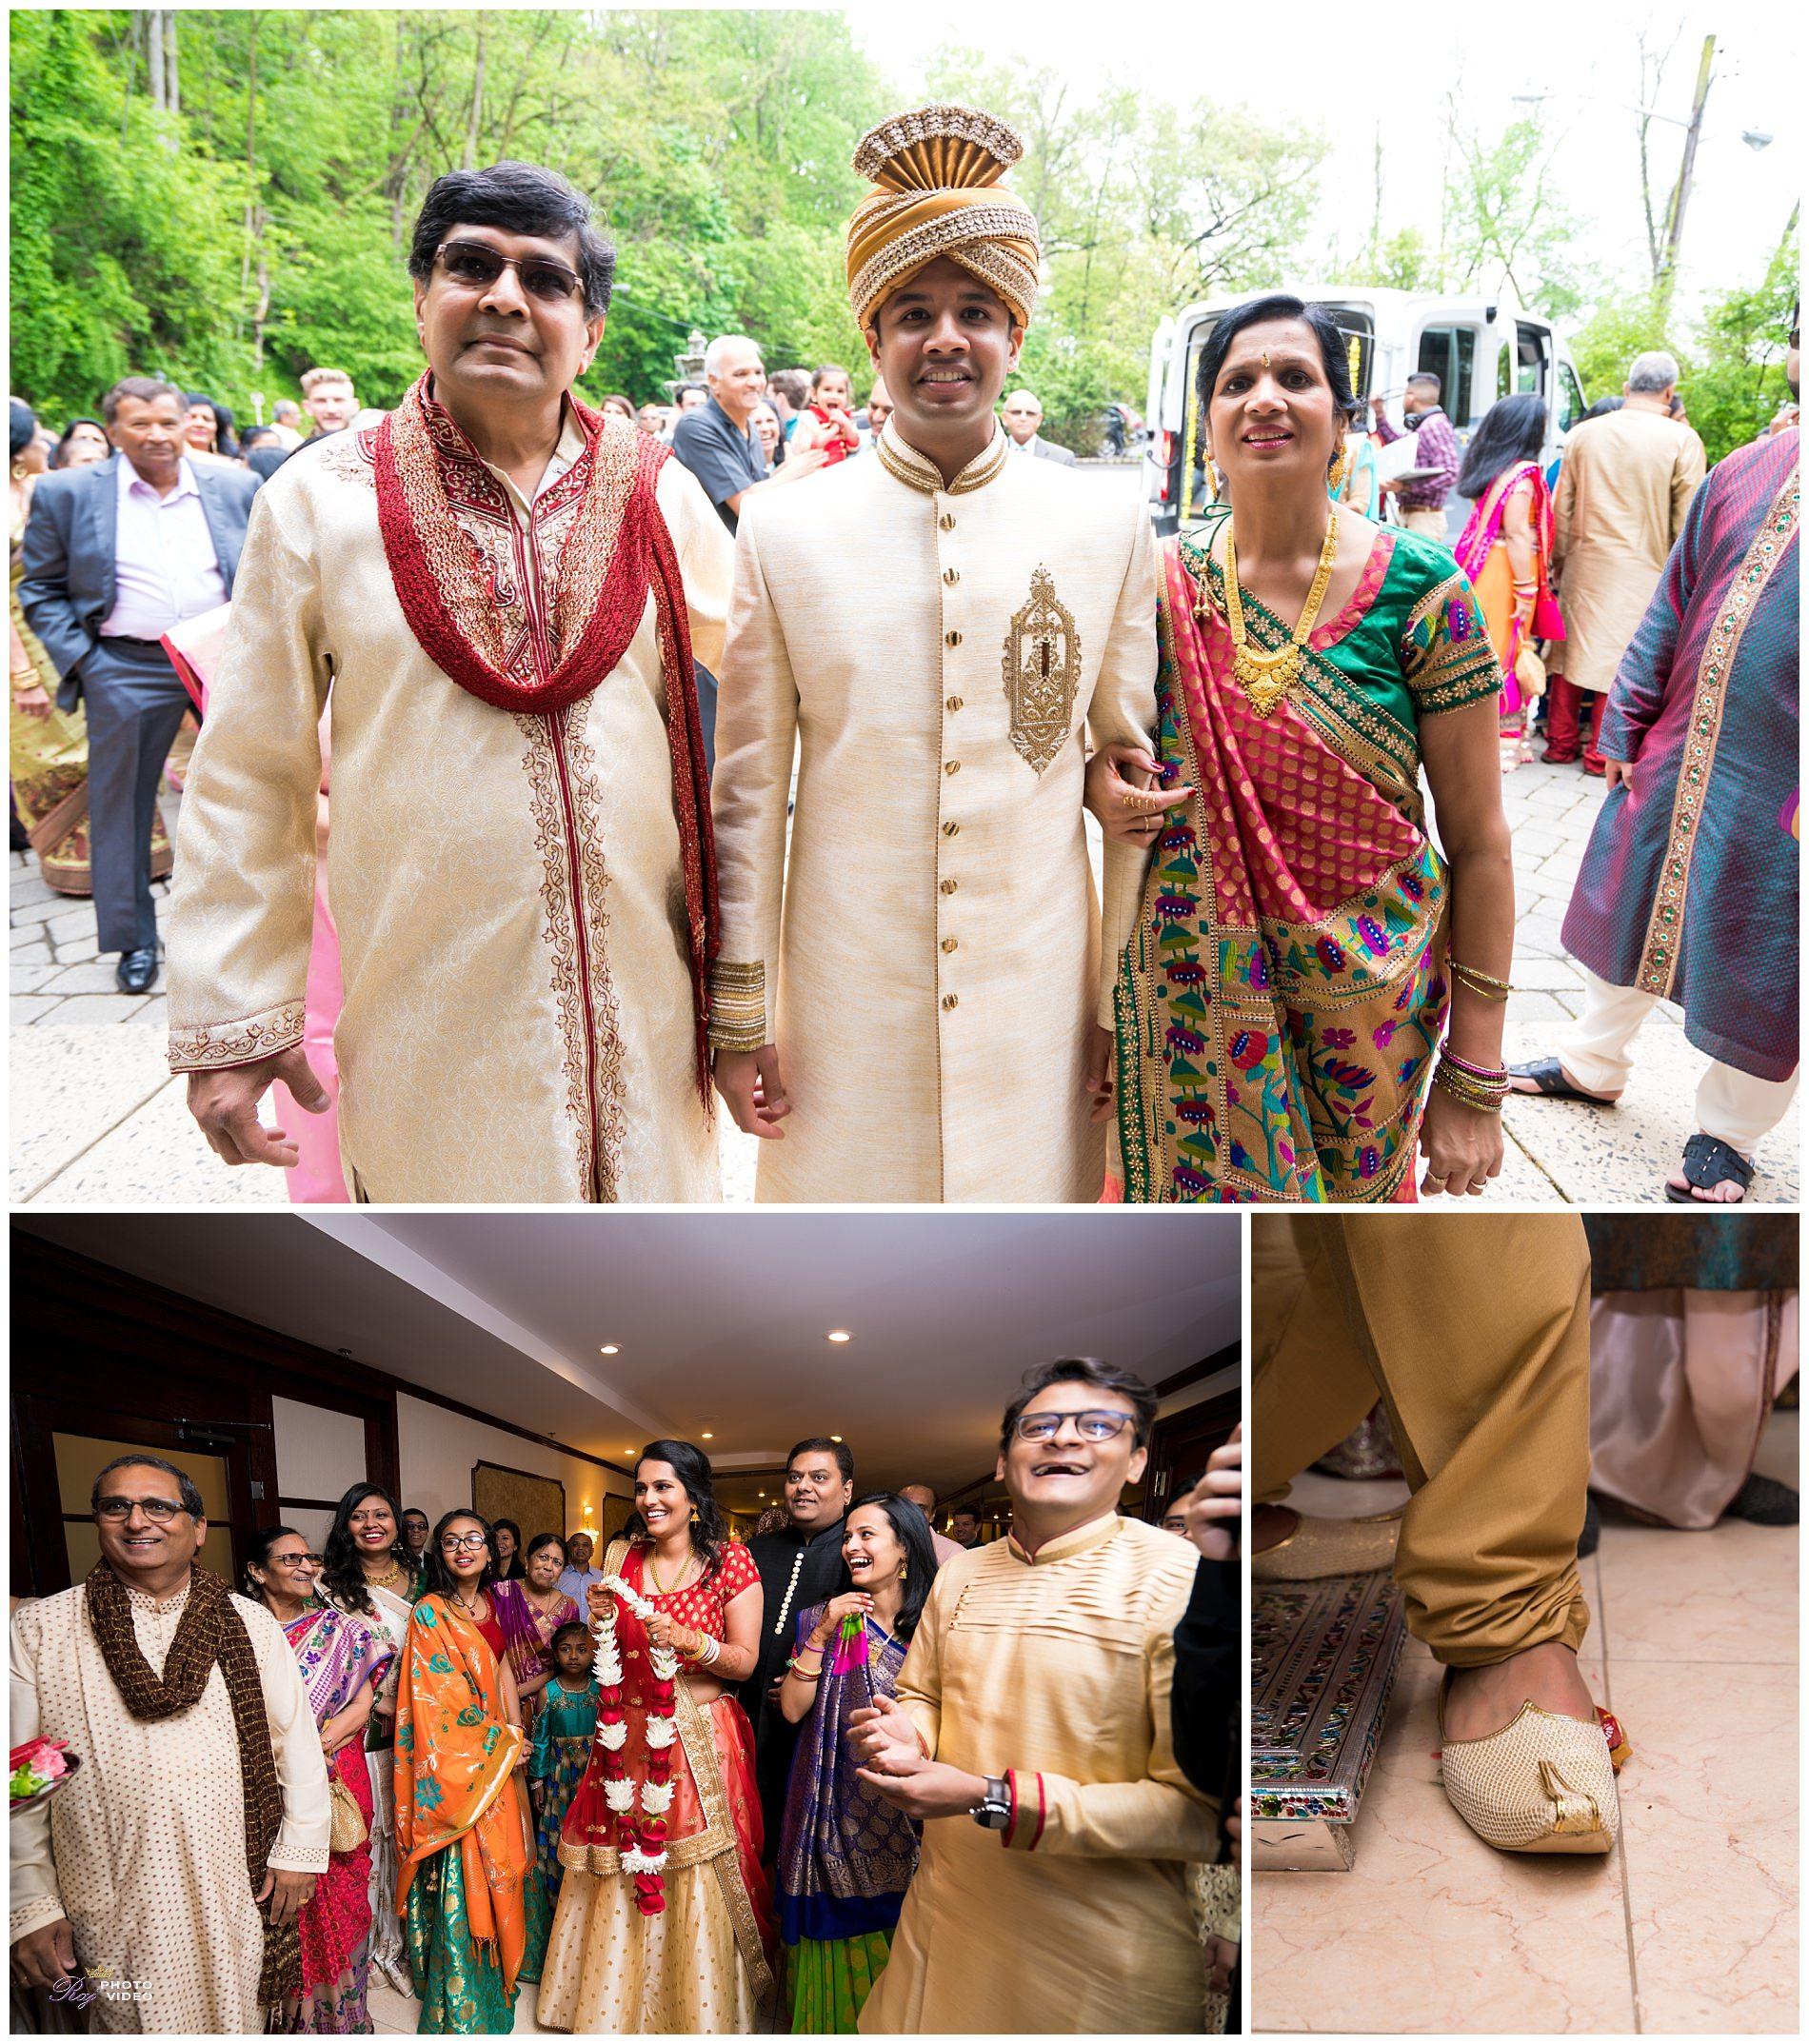 Martinsville-Gardens-NJ-Indian-Wedding-Ruchi-Vishal-21.jpg